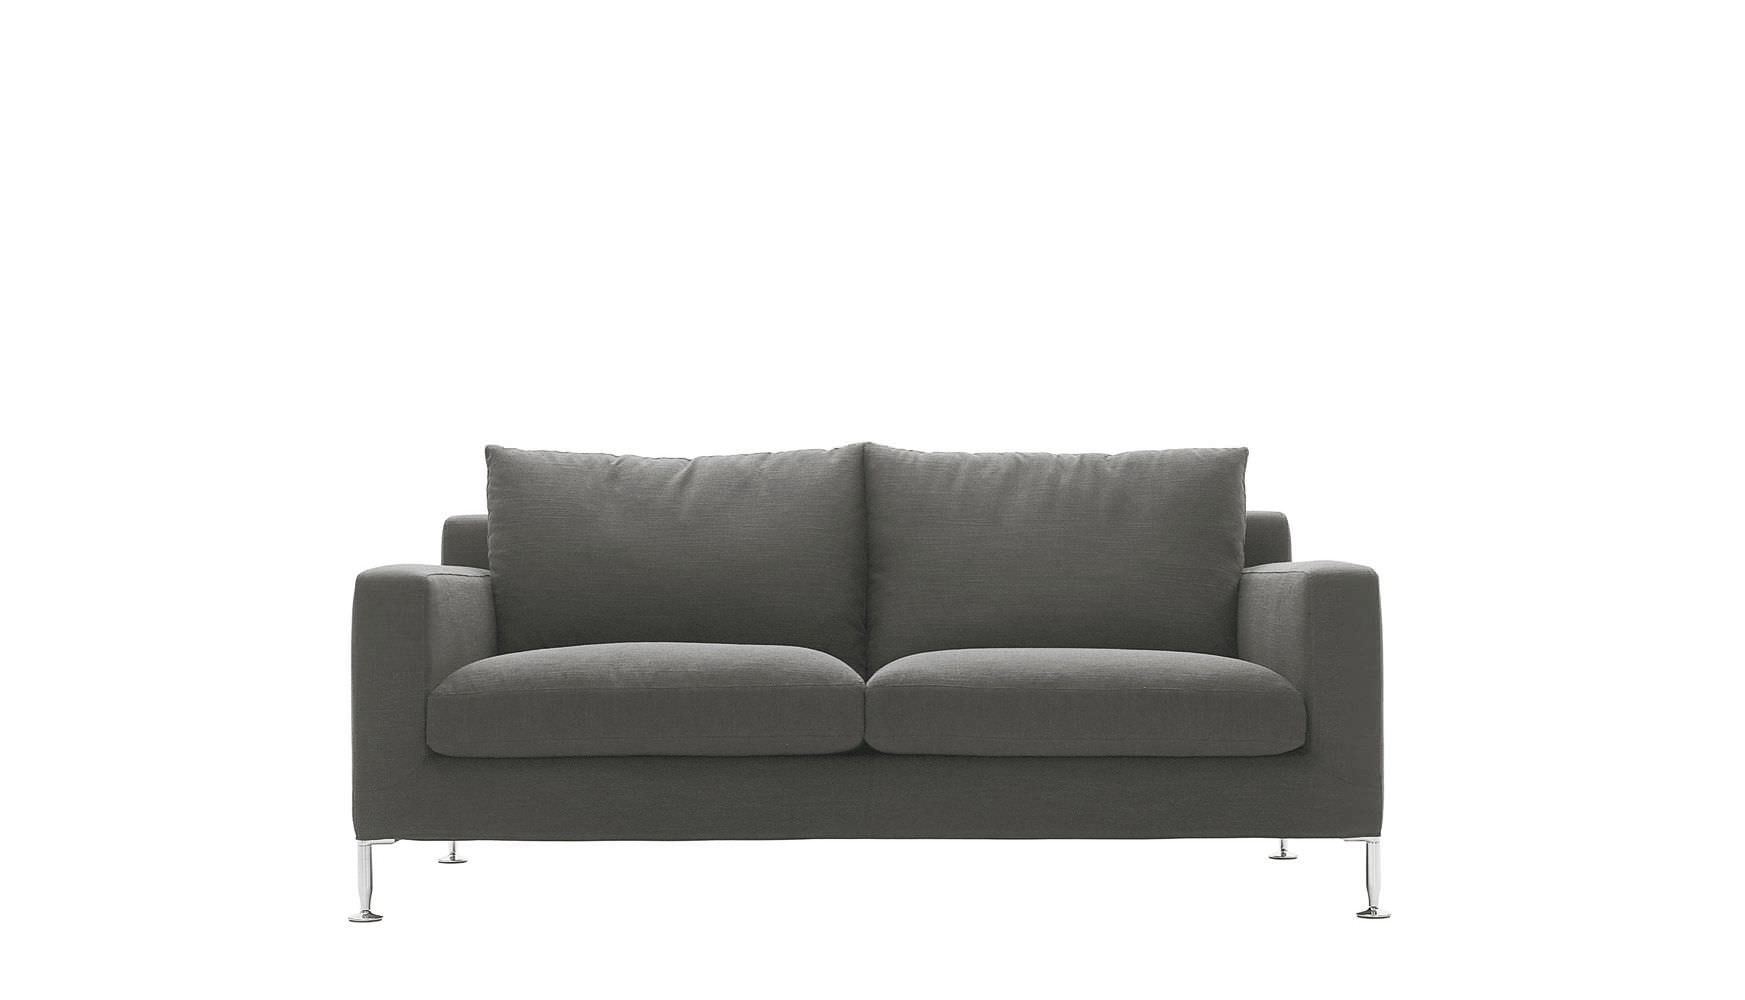 Contemporary Sofa Leather Fabric By Antonio Citterio Harry